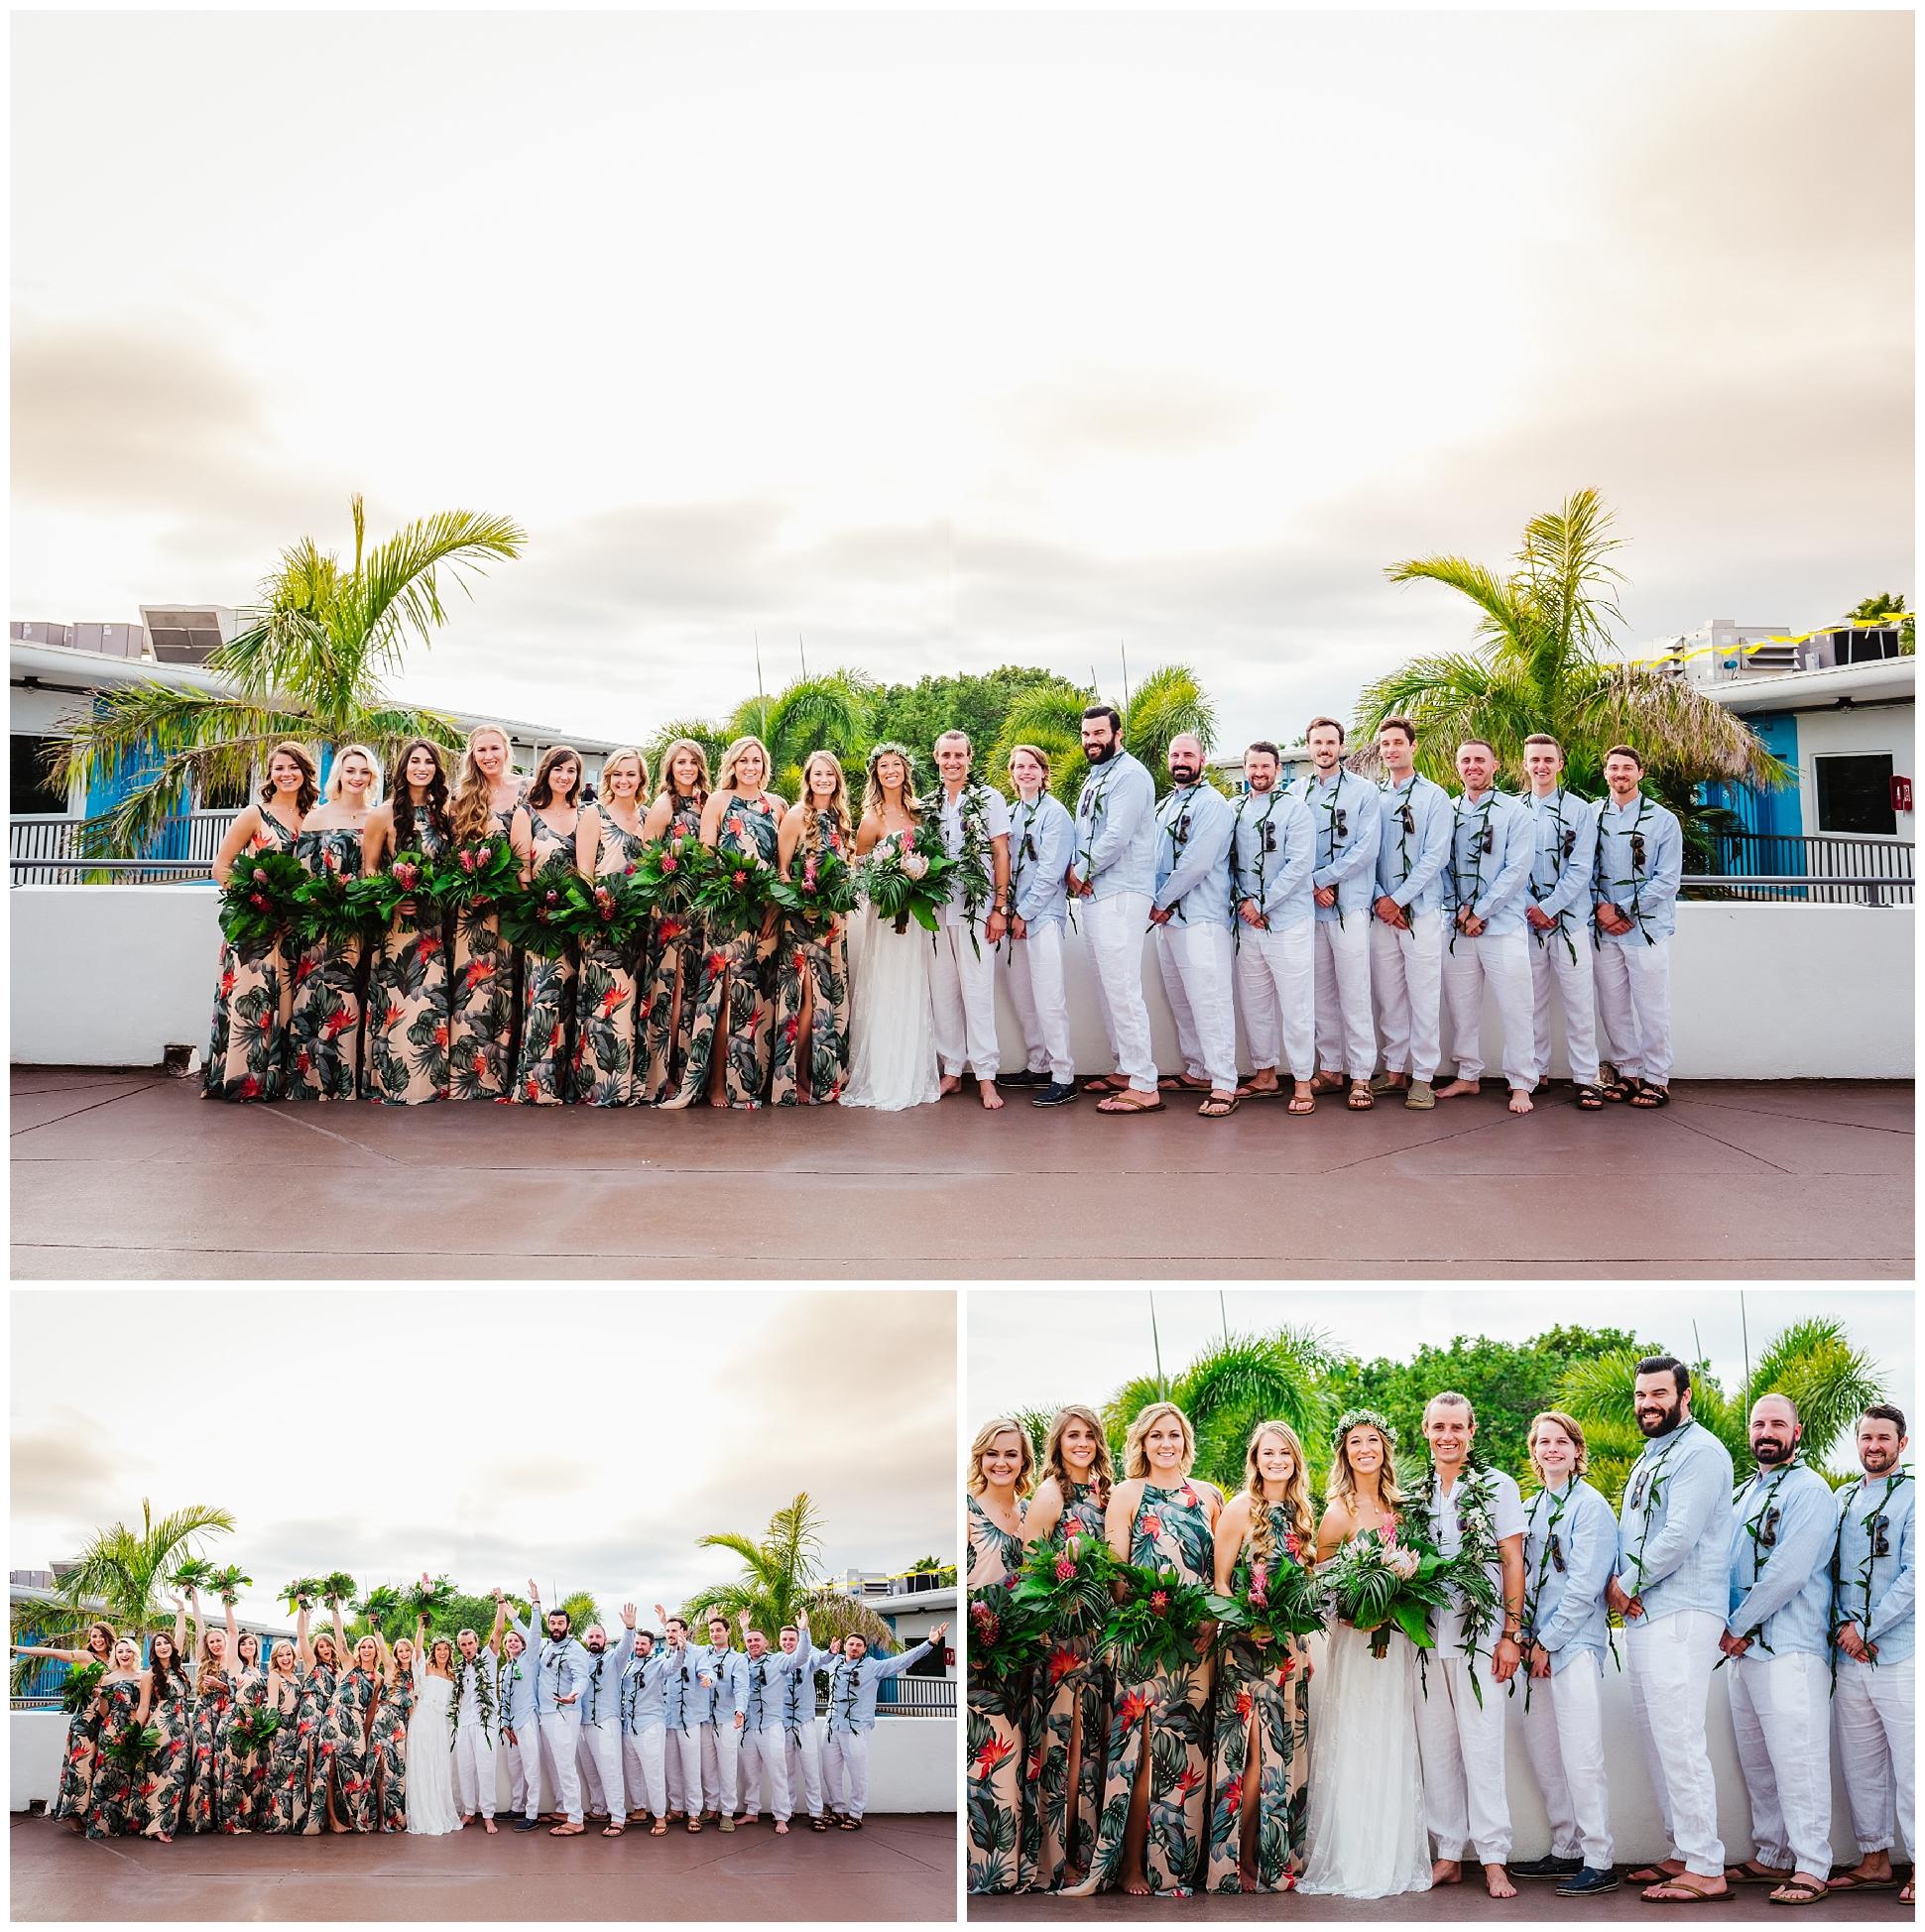 tampa-bay-wedding-photographer-barefoot-post-card-inn-tropical-hawaiin-lei-pink-pineapples-flower-crown_0141.jpg